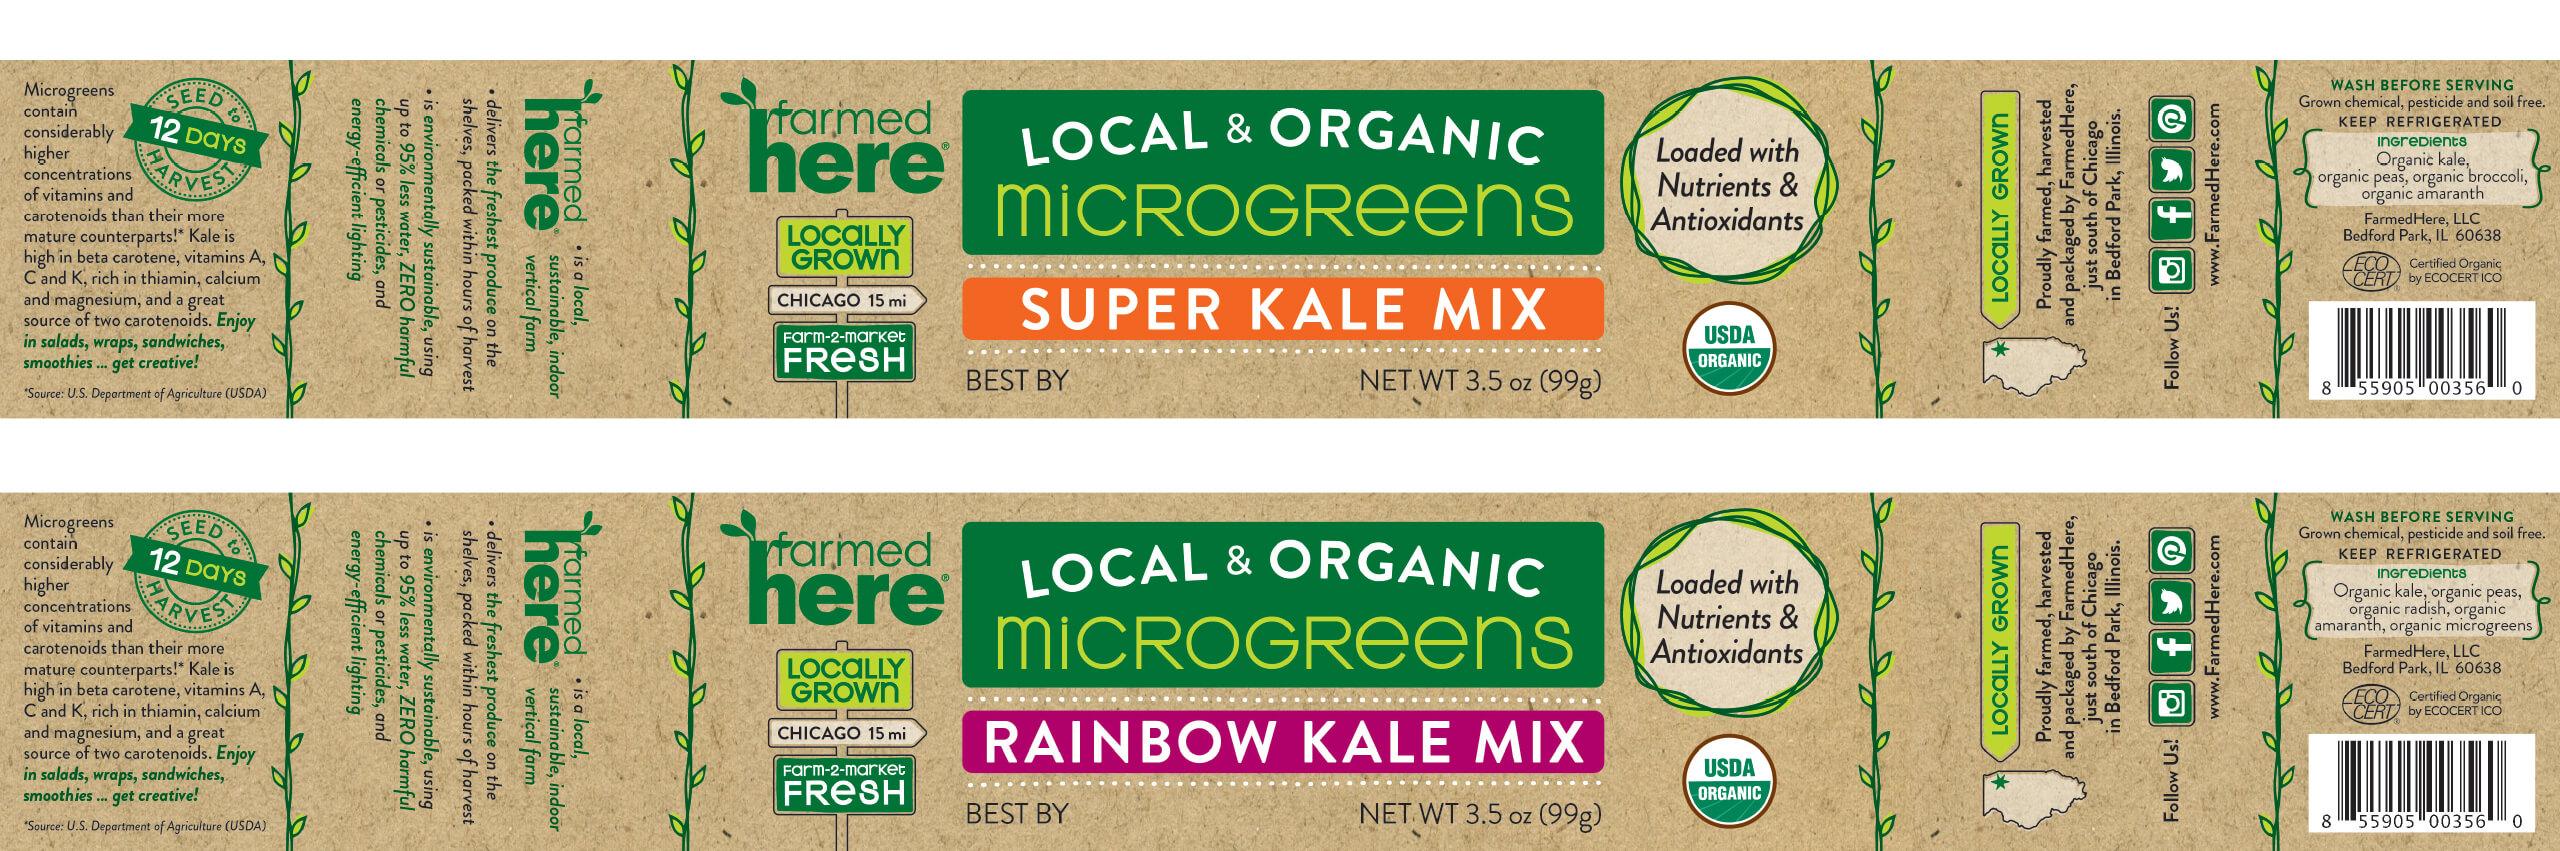 dtd farmedhere packaging microgreens group 1